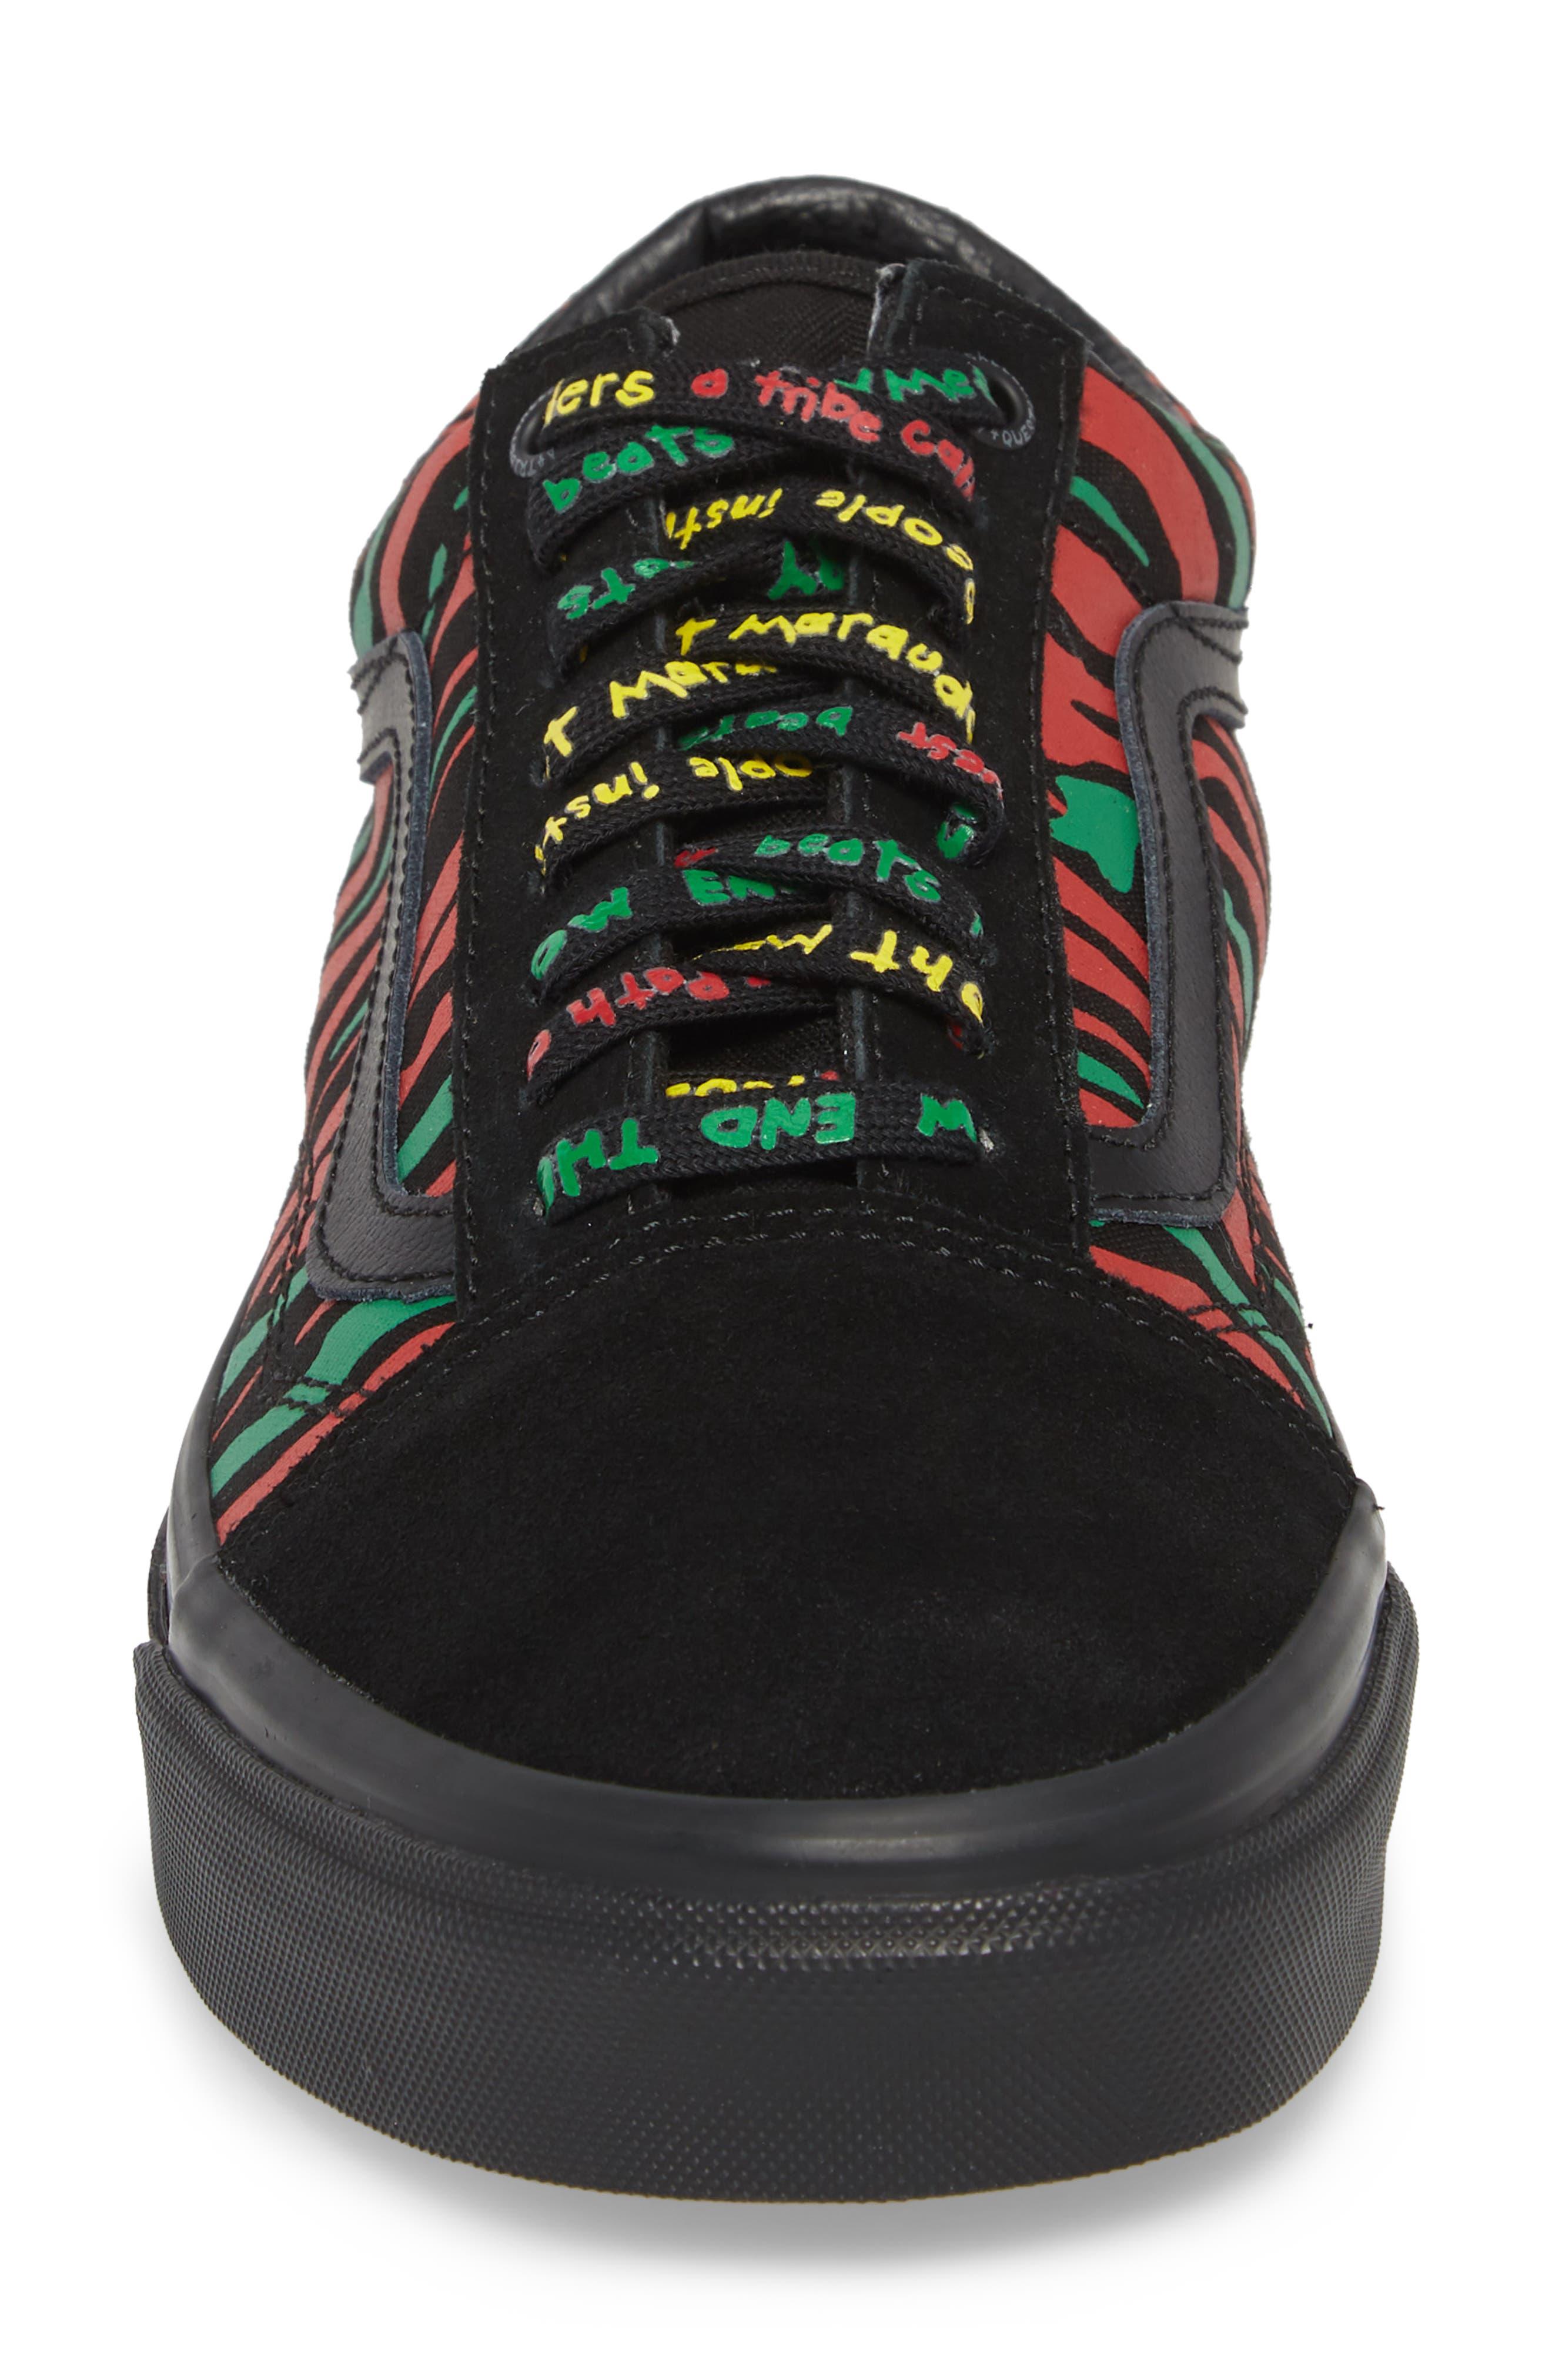 ATCQ Old Skool Sneaker,                             Alternate thumbnail 4, color,